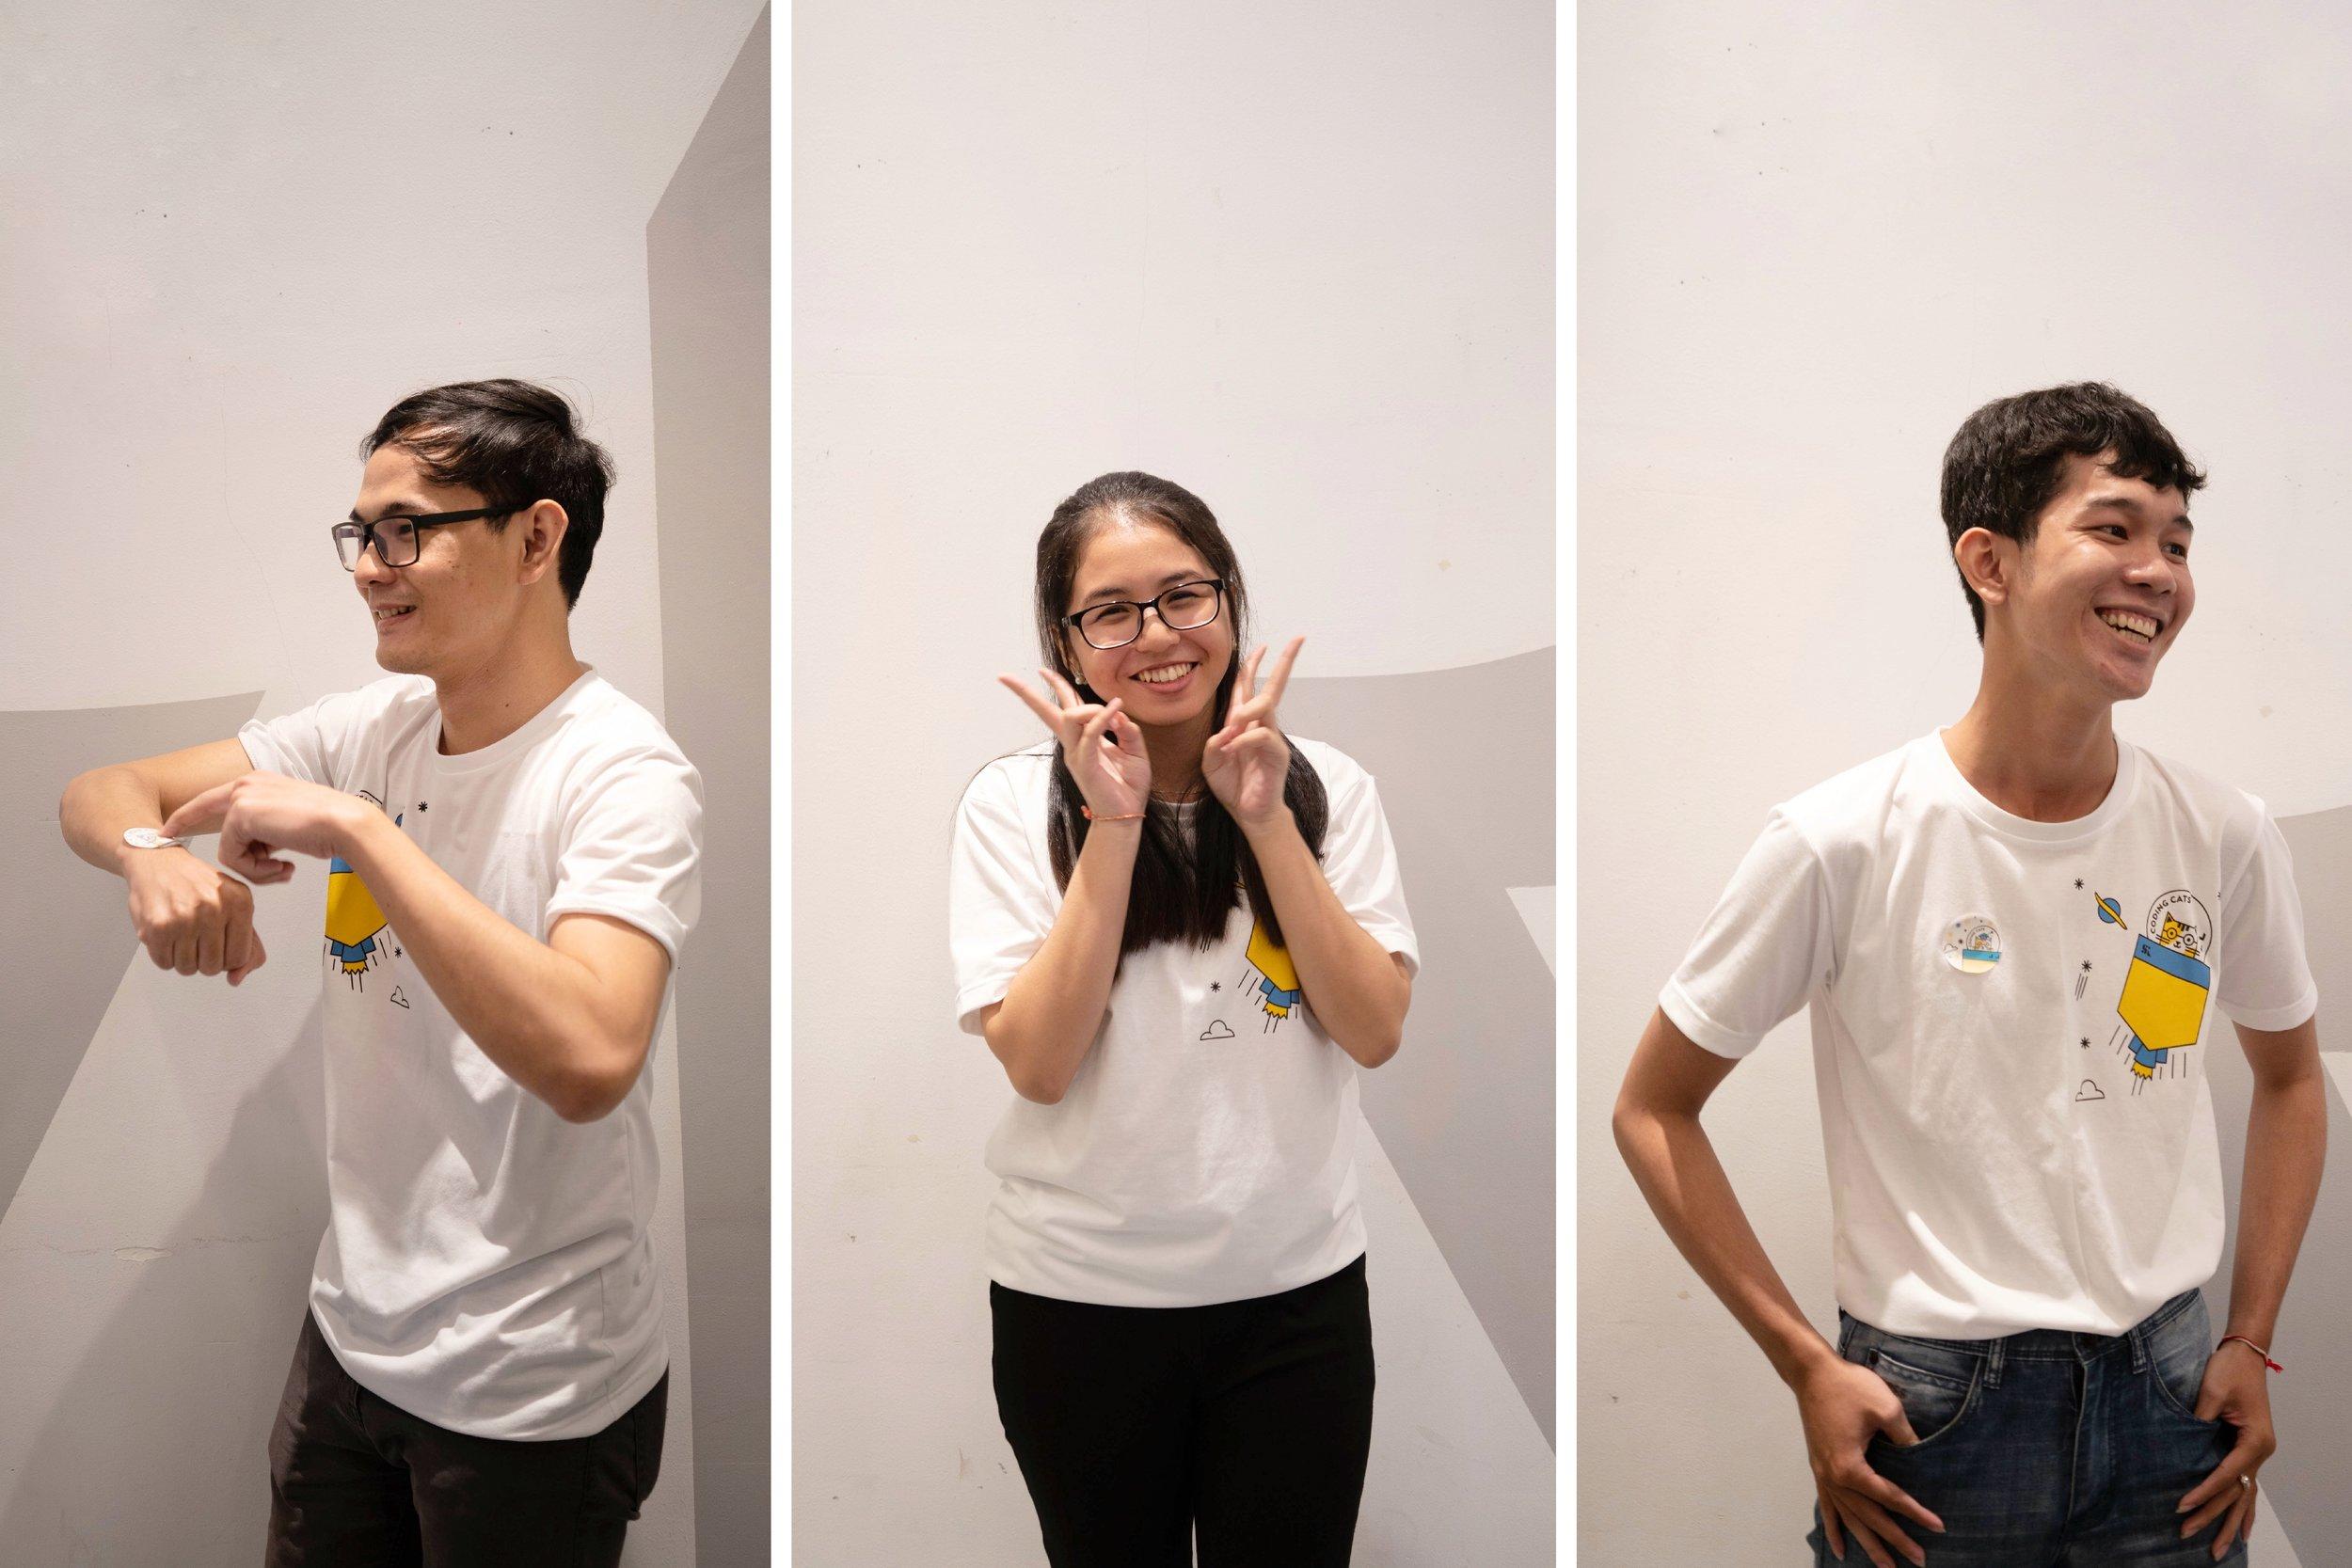 Our hero translator instructors: Sokunthearith Makara, Chandalya Lim, and Lyladang Sut